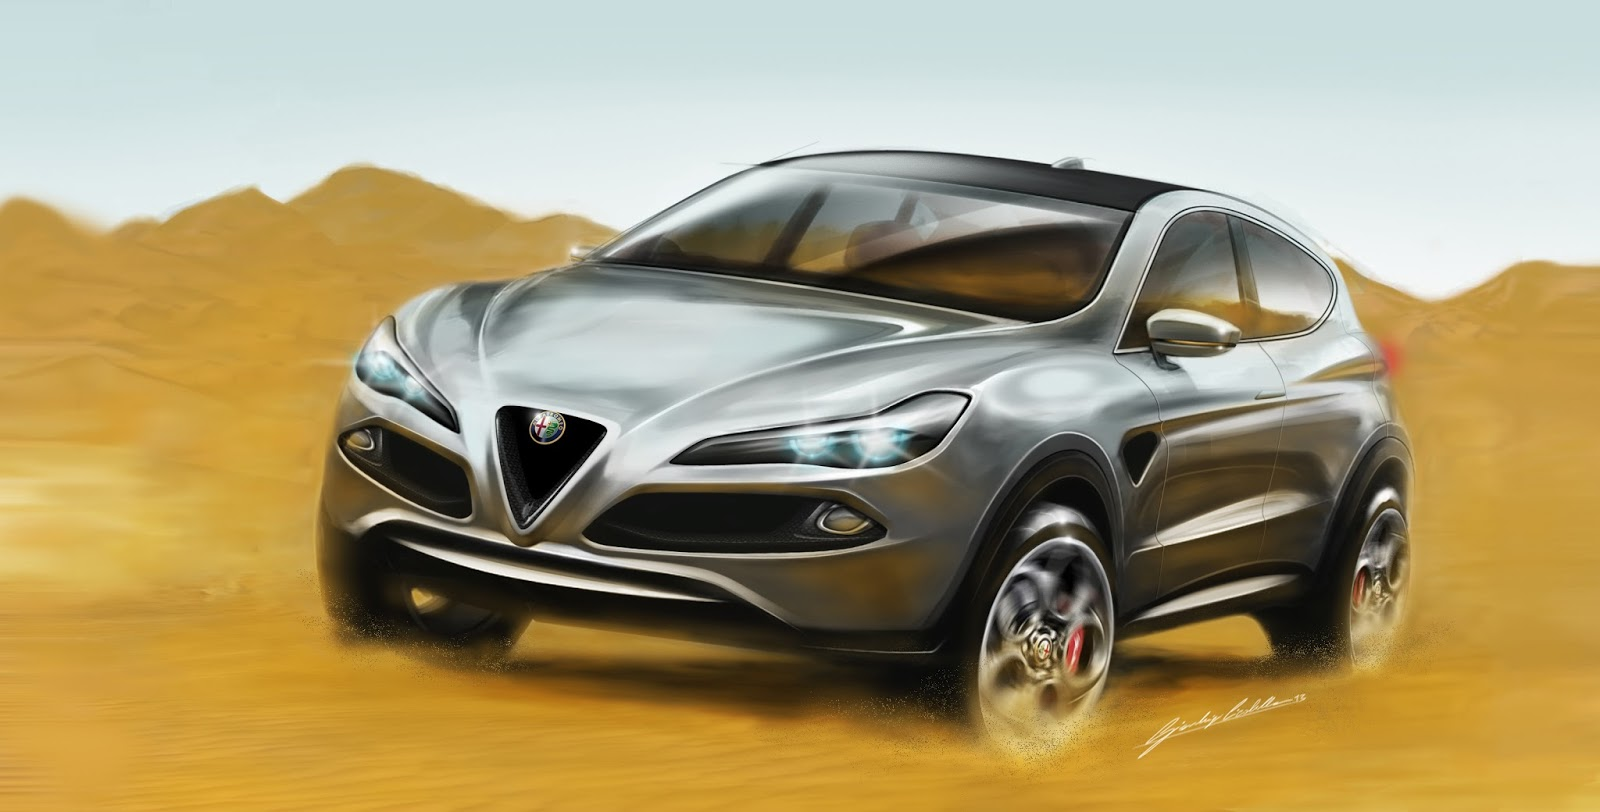 Alfa Romeo Suv Price Alfa Romeo c Suv Alfa Romeo